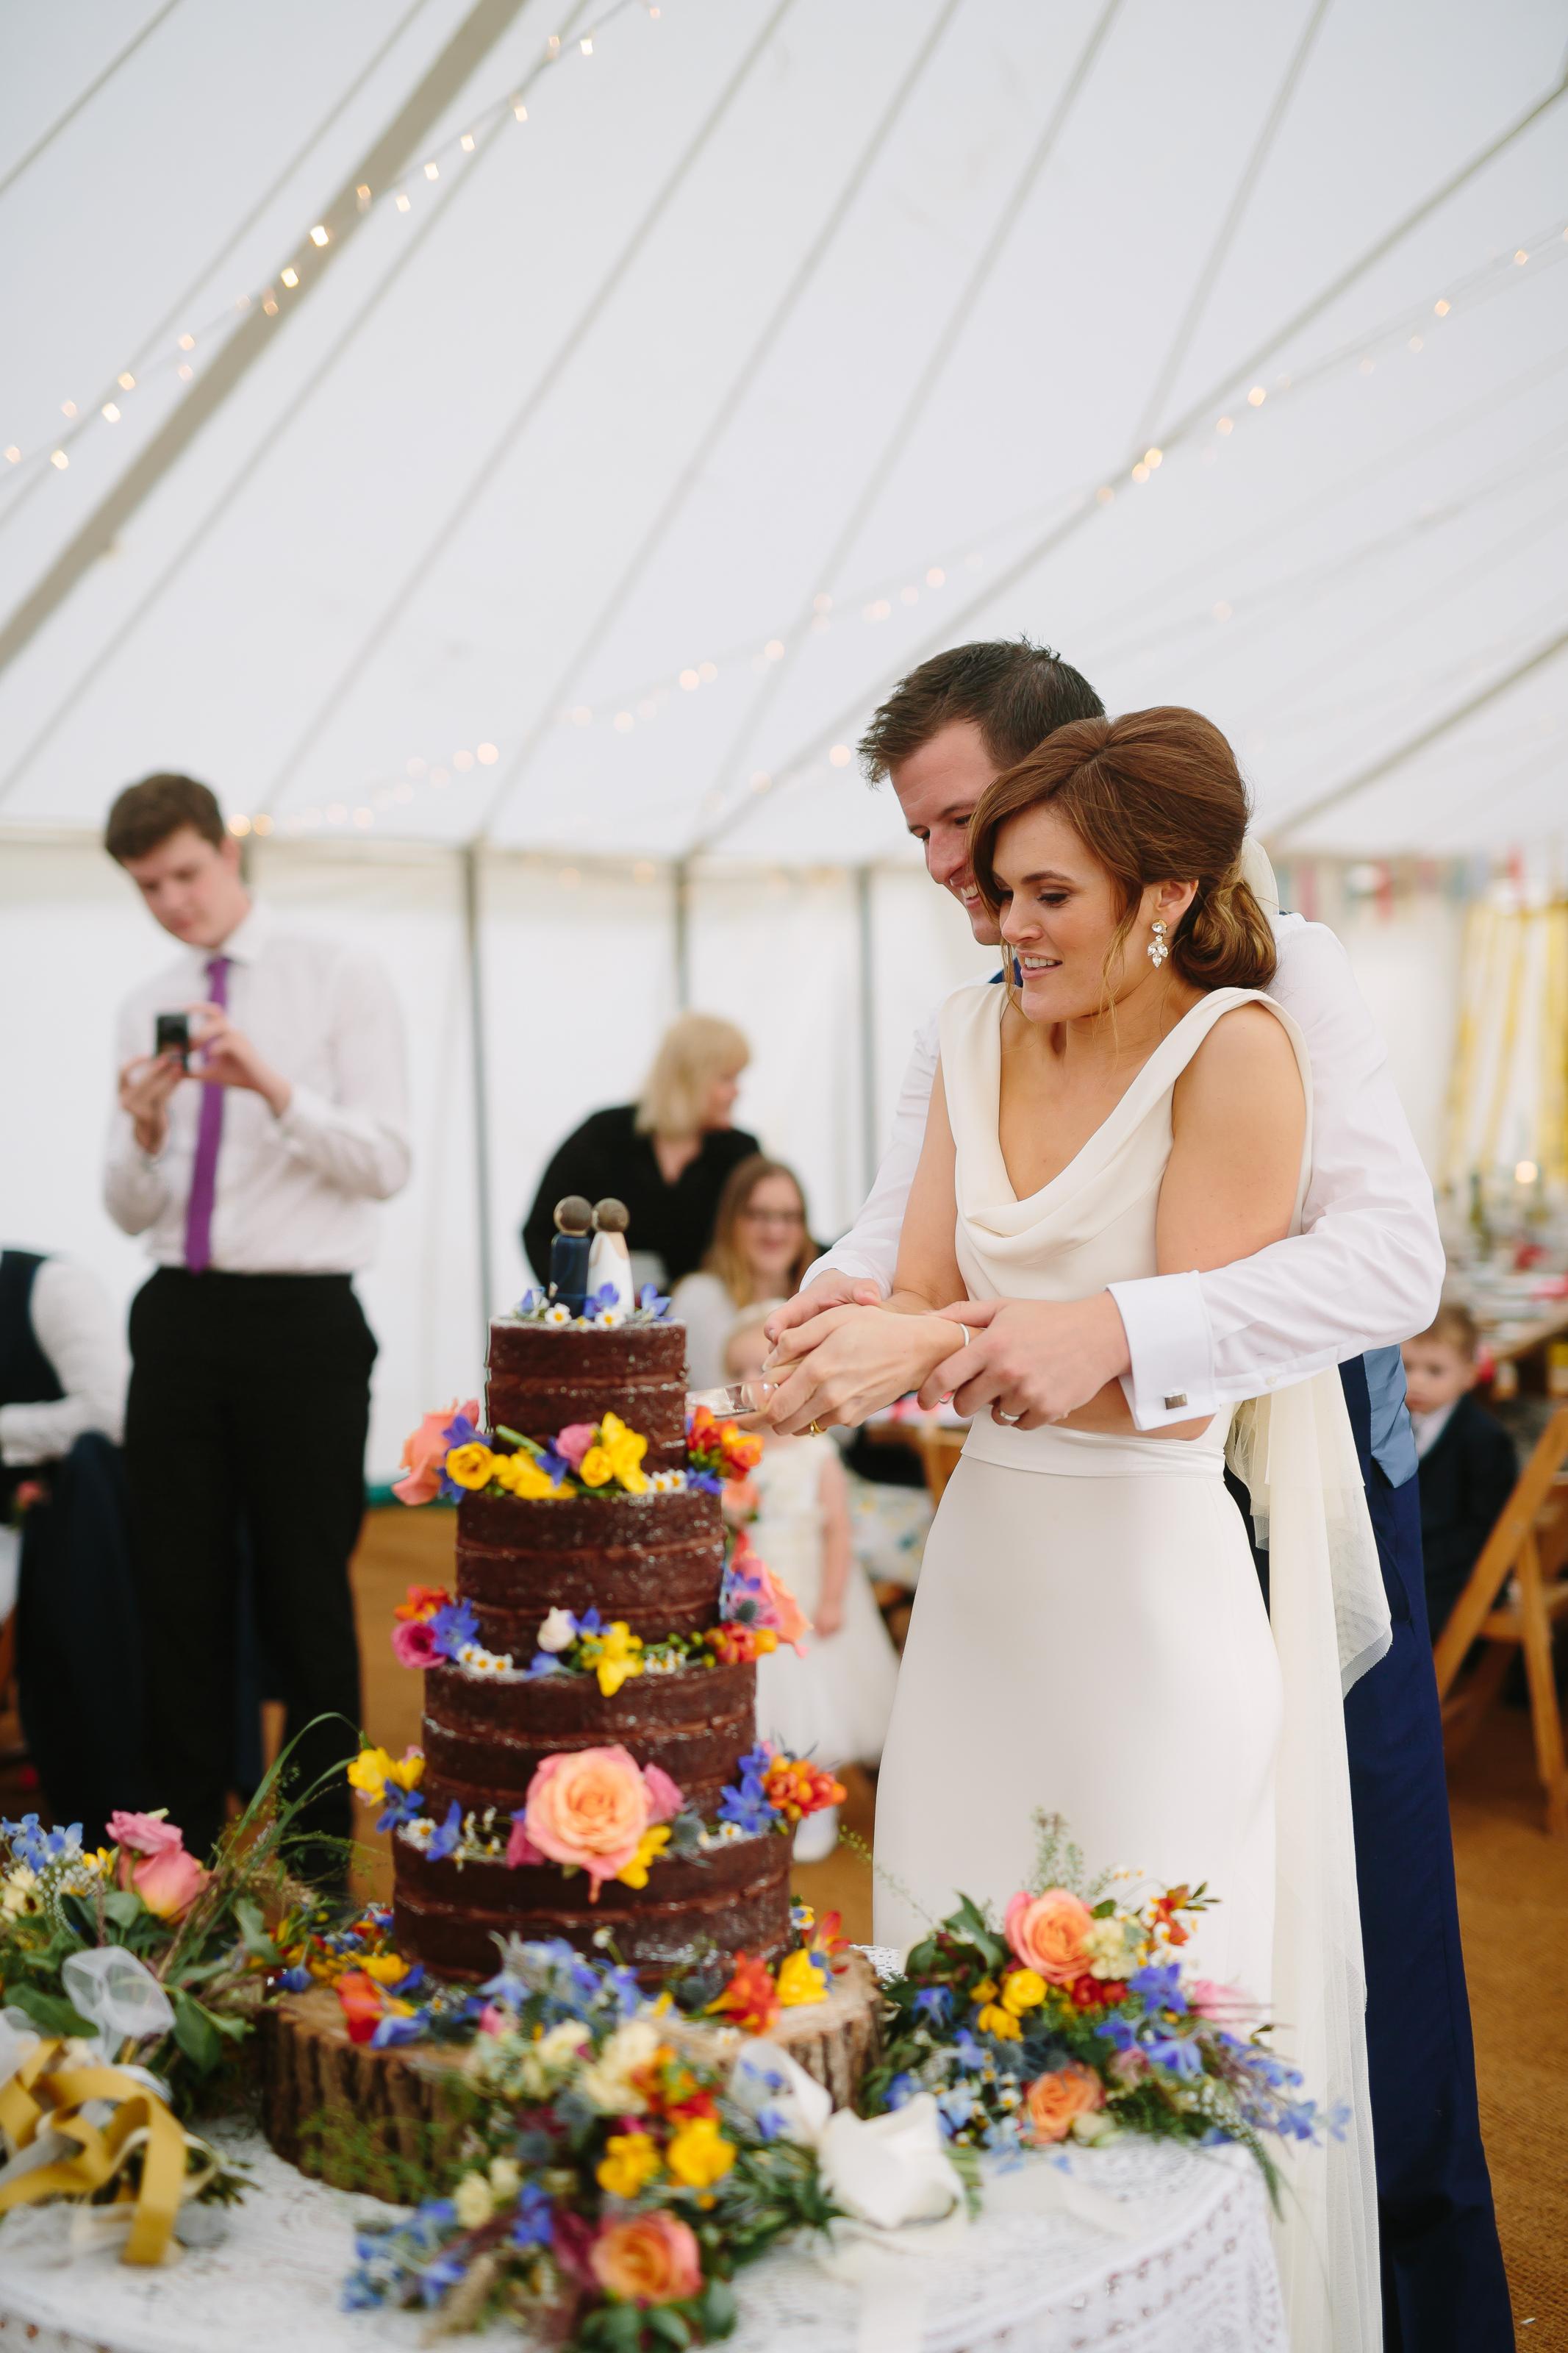 Wedding-Stockerston-Weddingphotographer-77.jpg